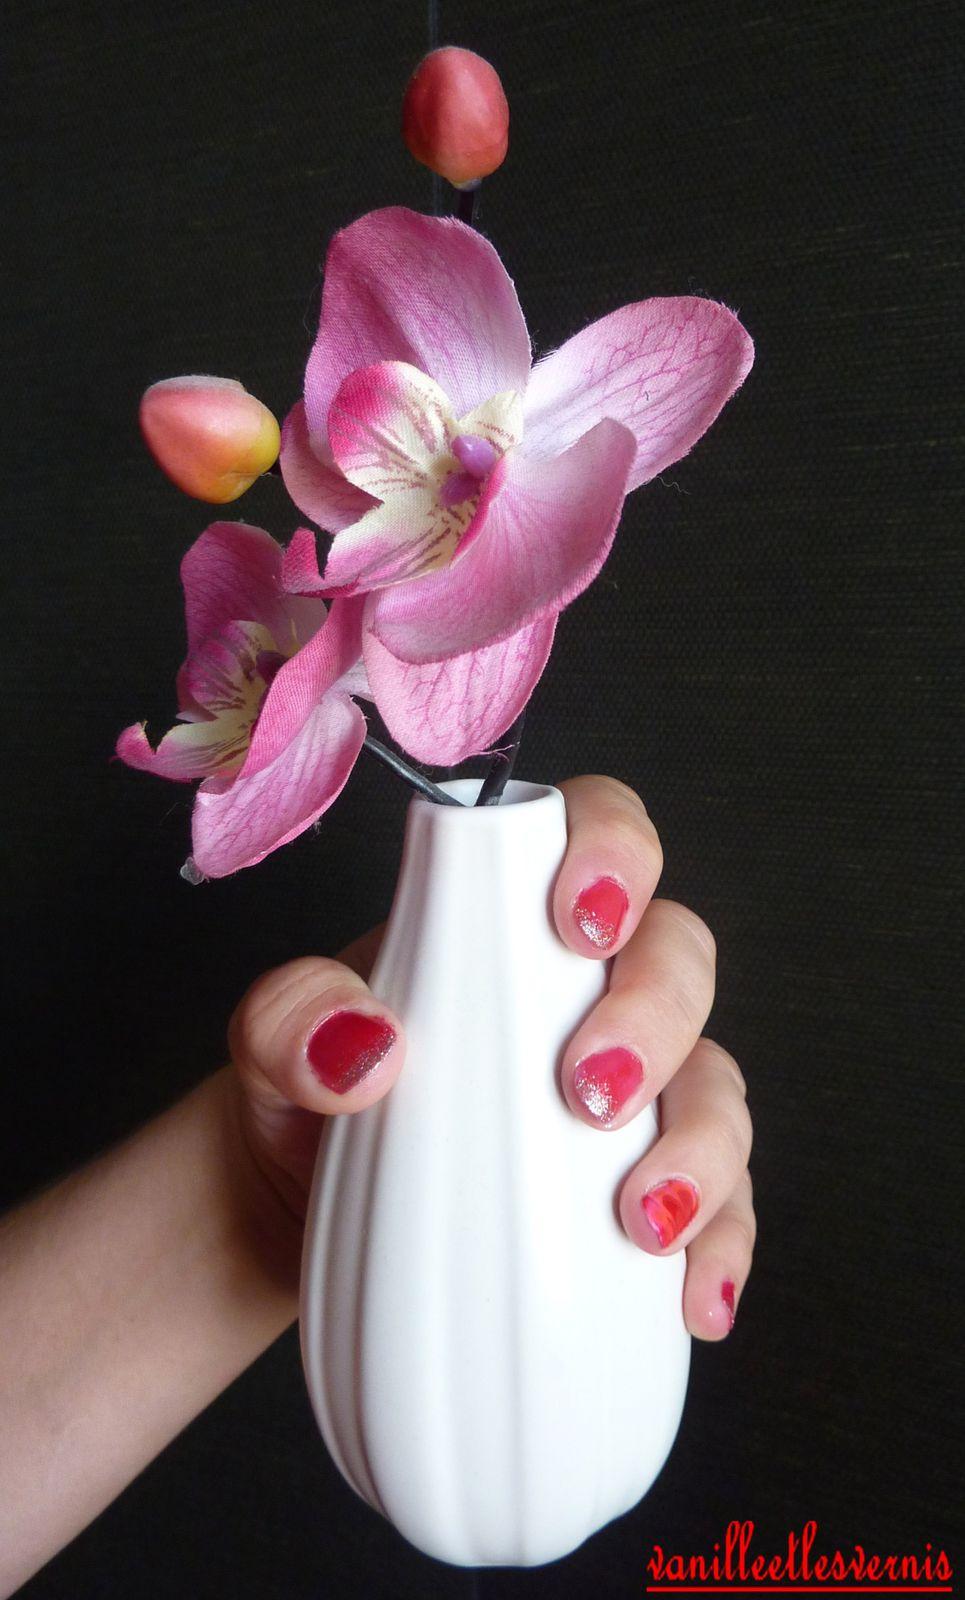 bon, tu l'as compris je like les fleurs!! &#x3B;)